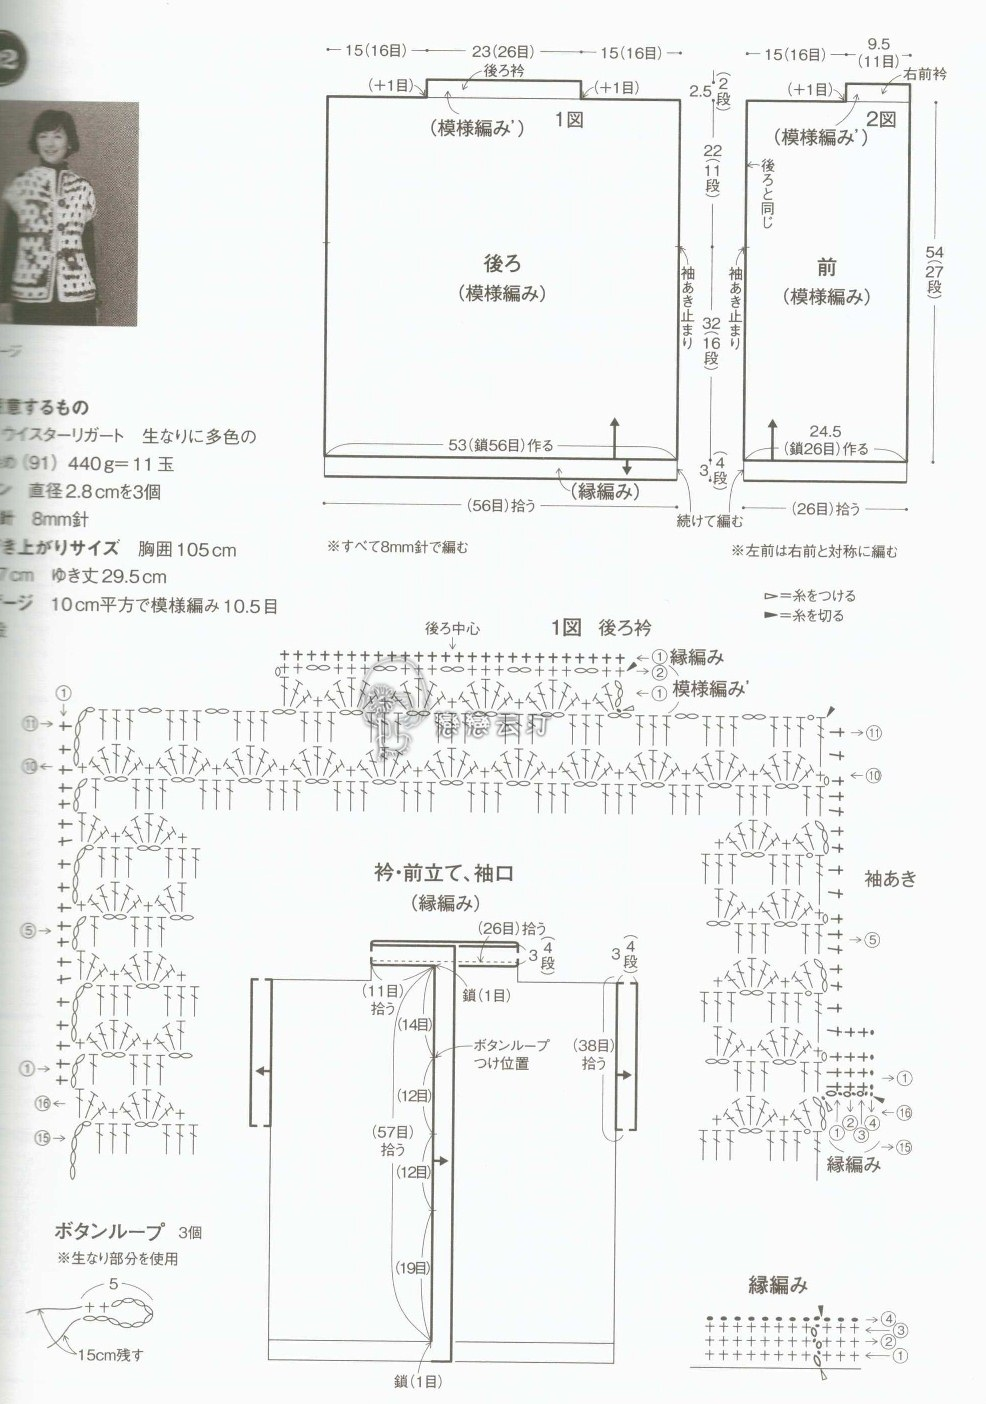 0866_NV80486 (7)